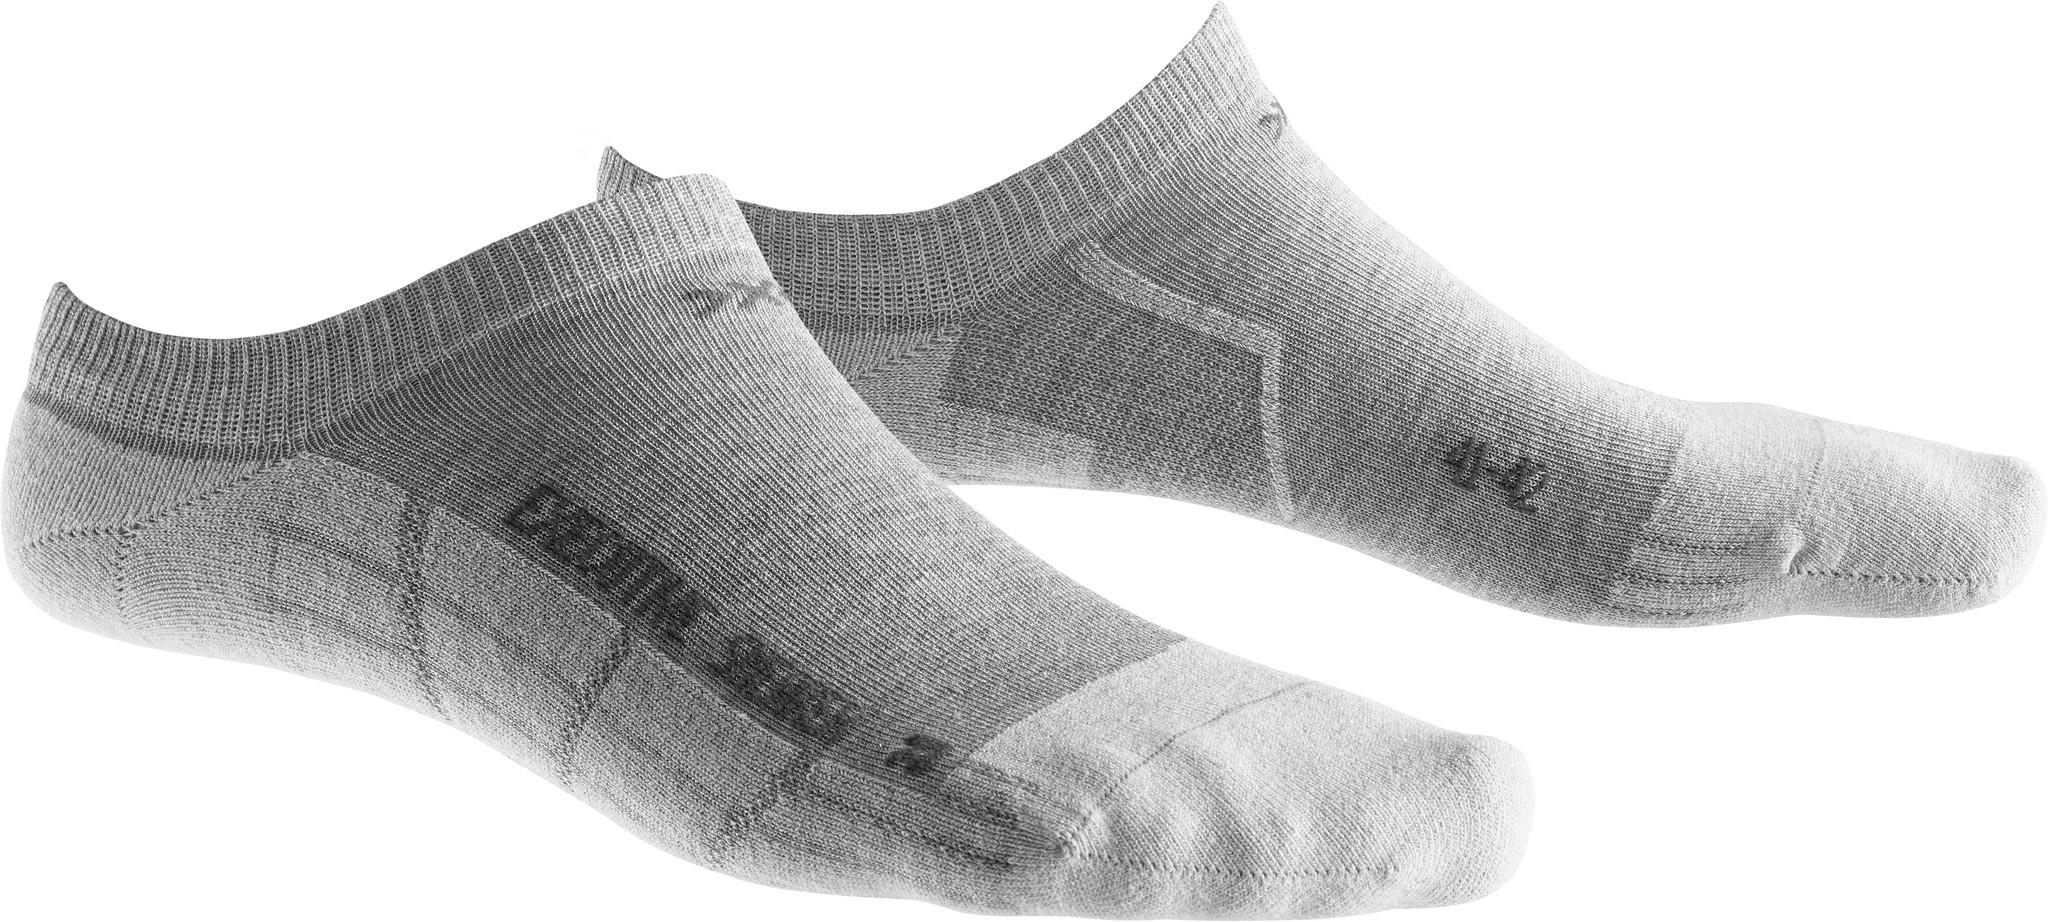 X-SOCKS Socken, Strümpfe Sneaker Executive Hellgrau unisex von Gr. 39 - 46 S17-XS1